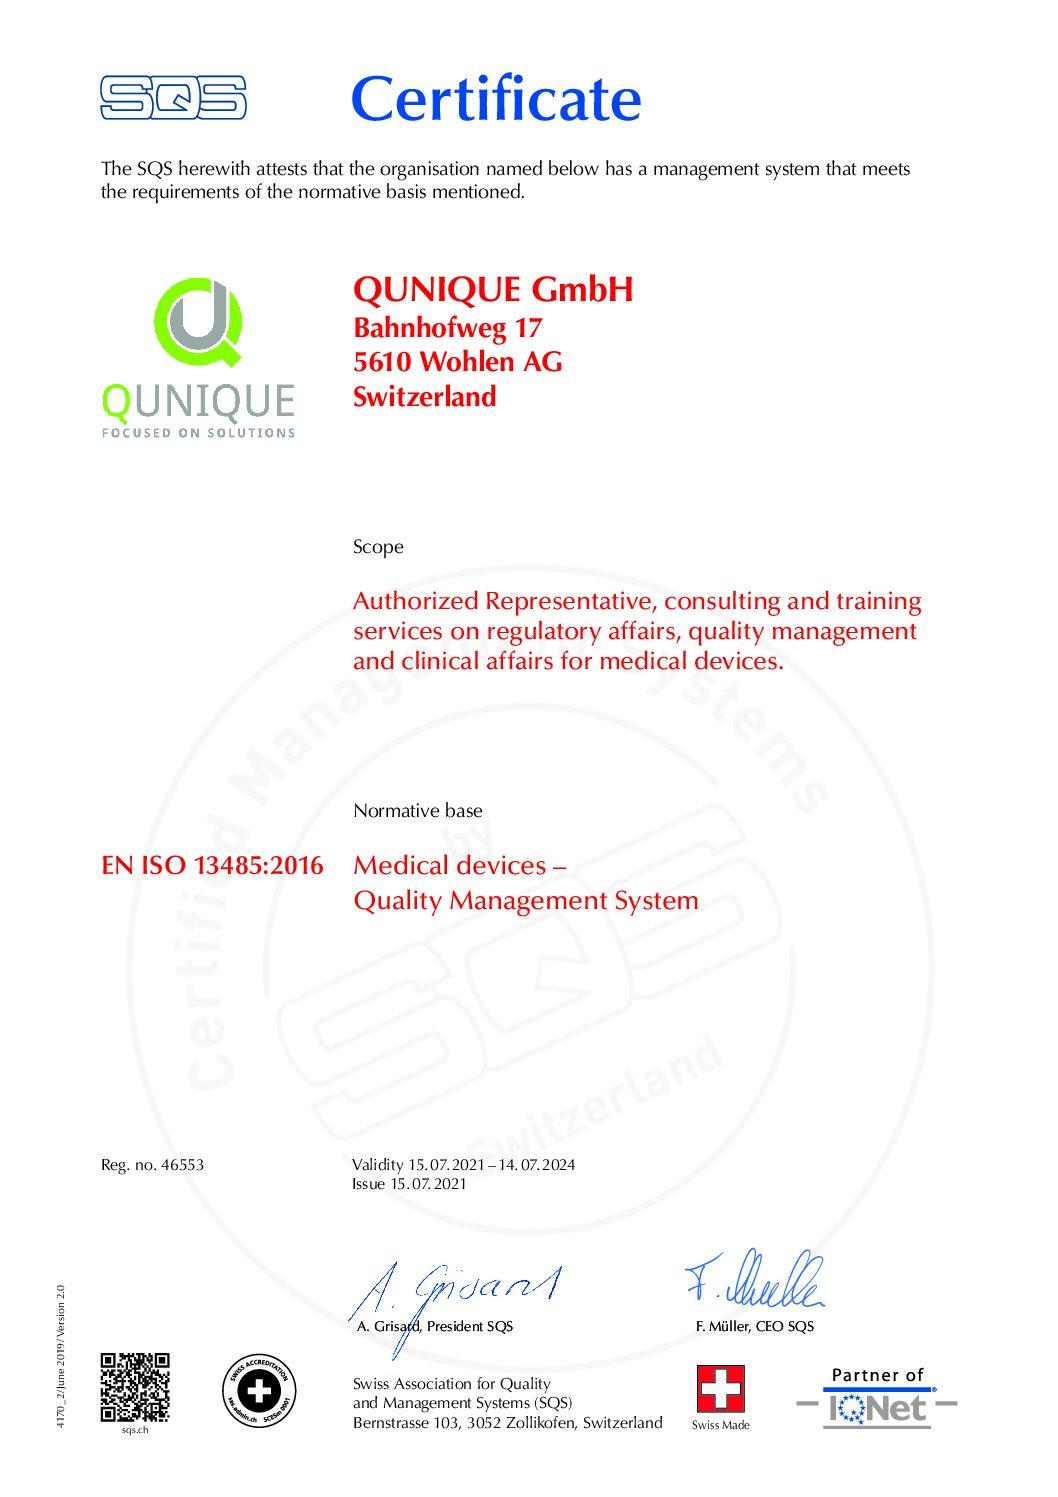 Certificate SQS Zertifiziertes Managementsystem EN ISO 13485